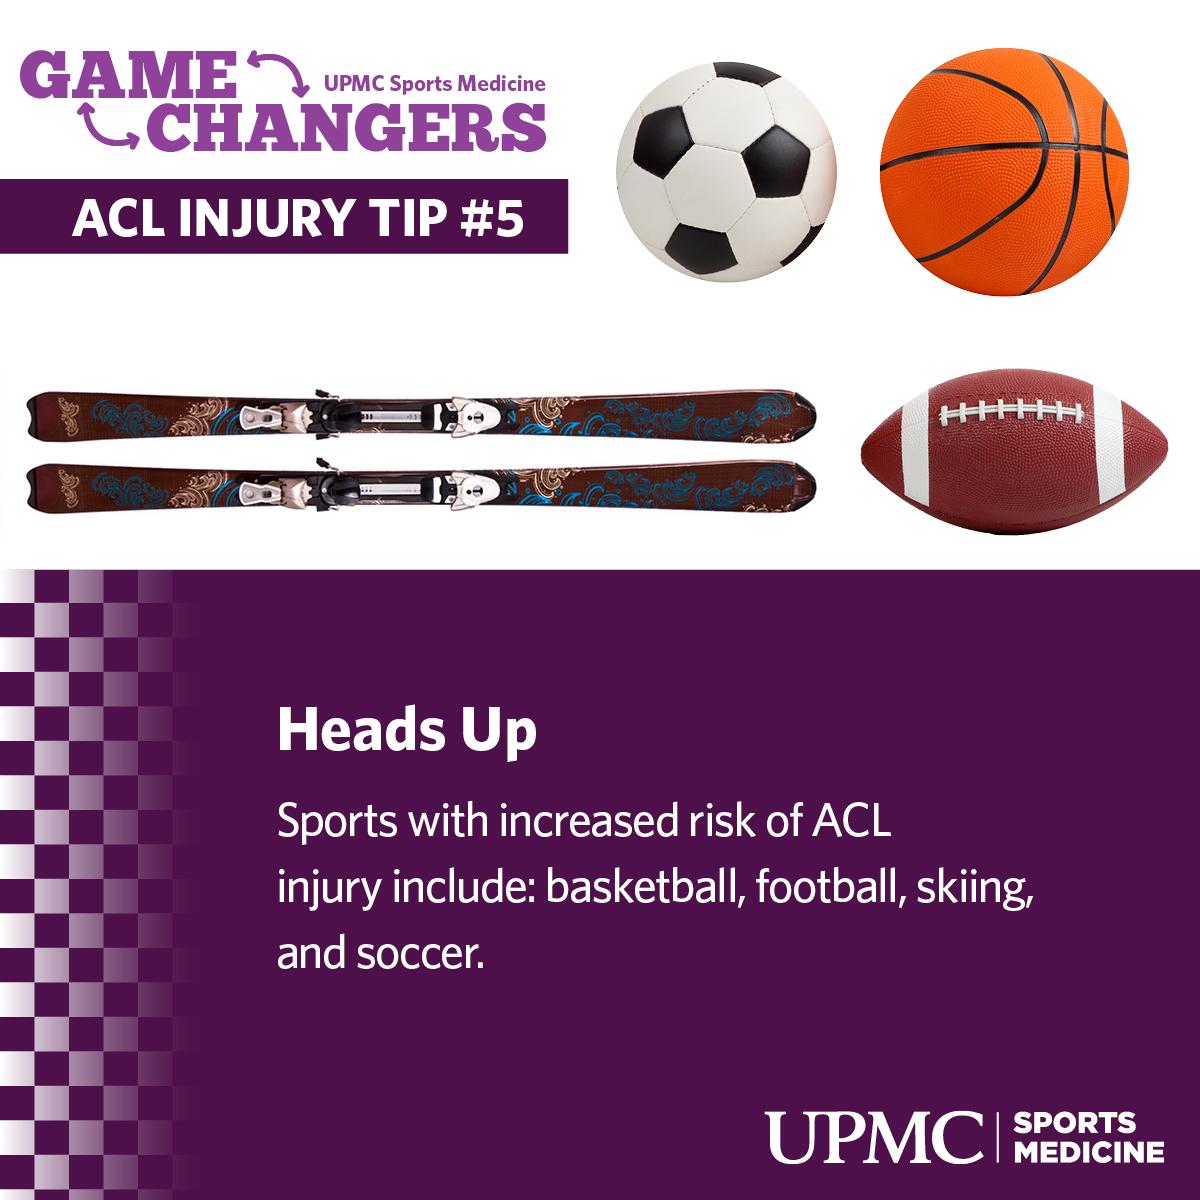 UPMC_GameChangers_ACL_FB5_FINAL